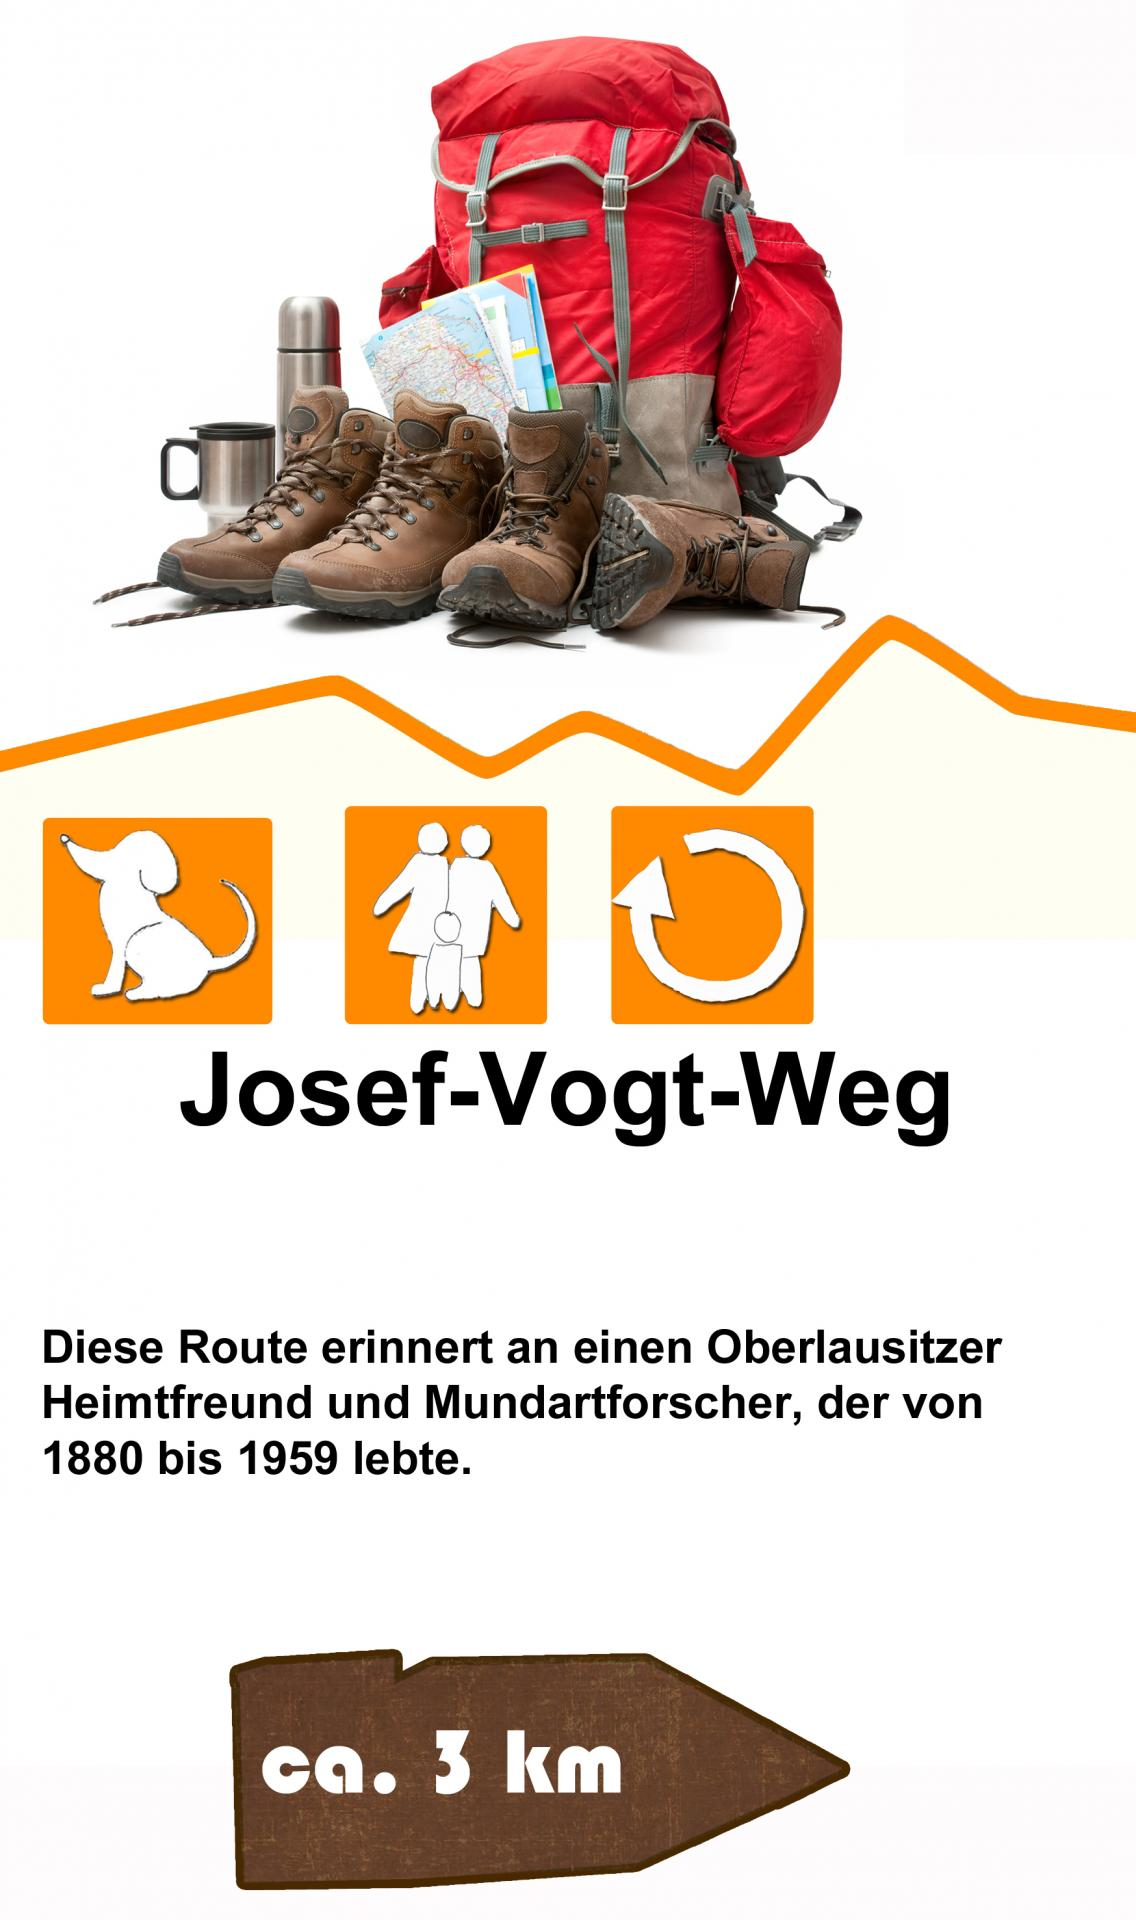 Josef-vogt-weg Schirgiswalde-Kirschau